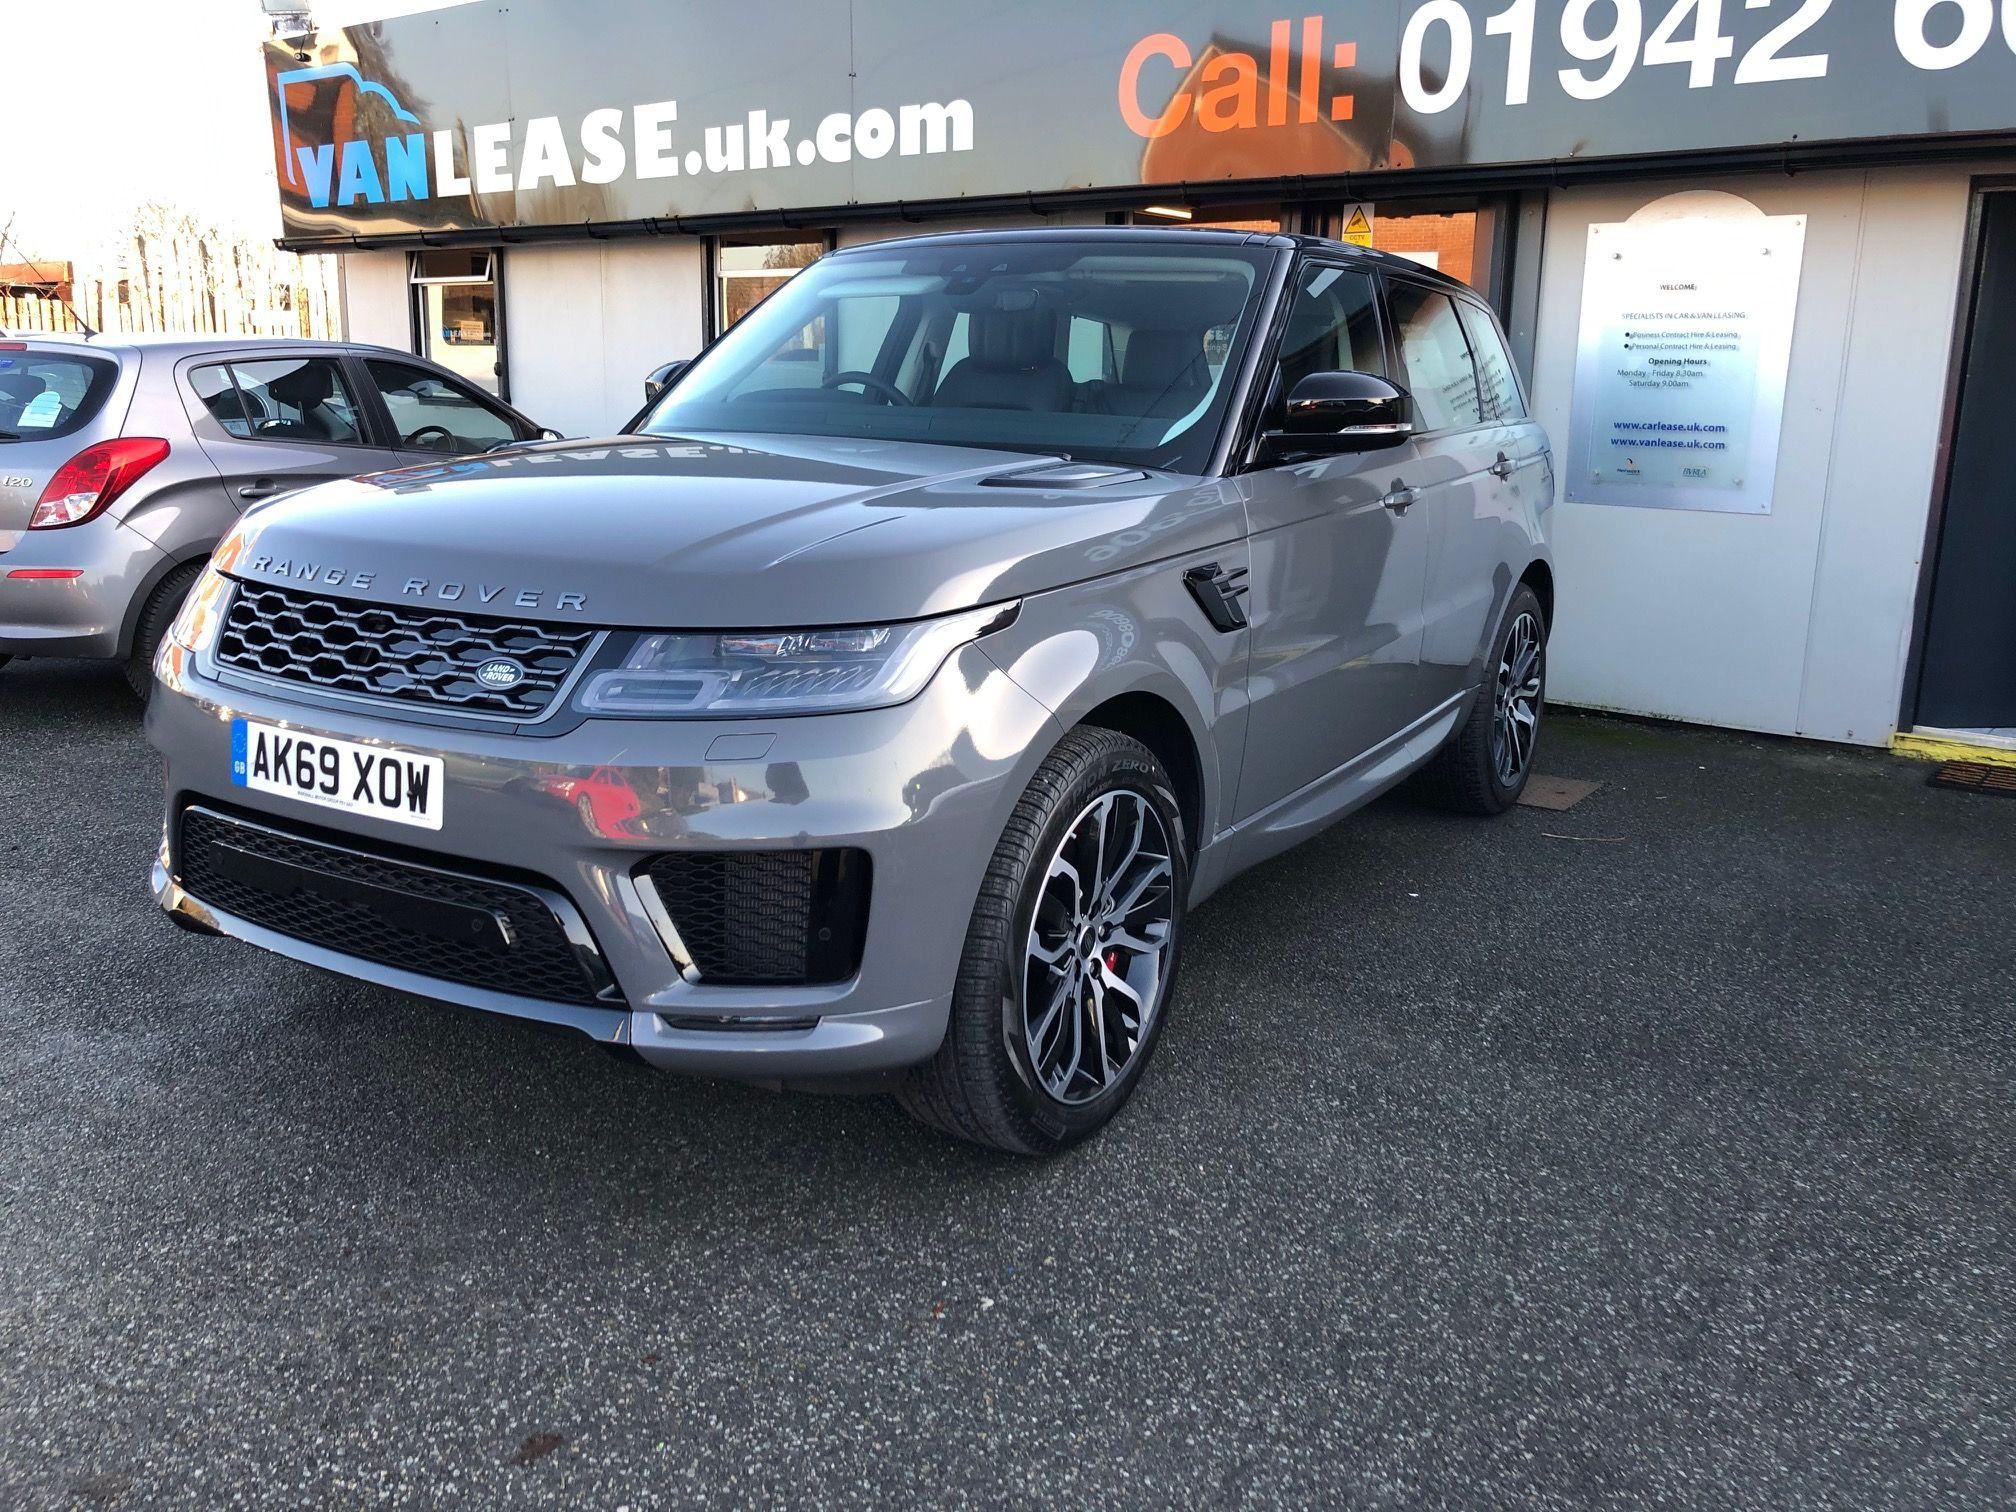 Rr Sport Phev In 2020 Range Rover Sport Car Lease Range Rover